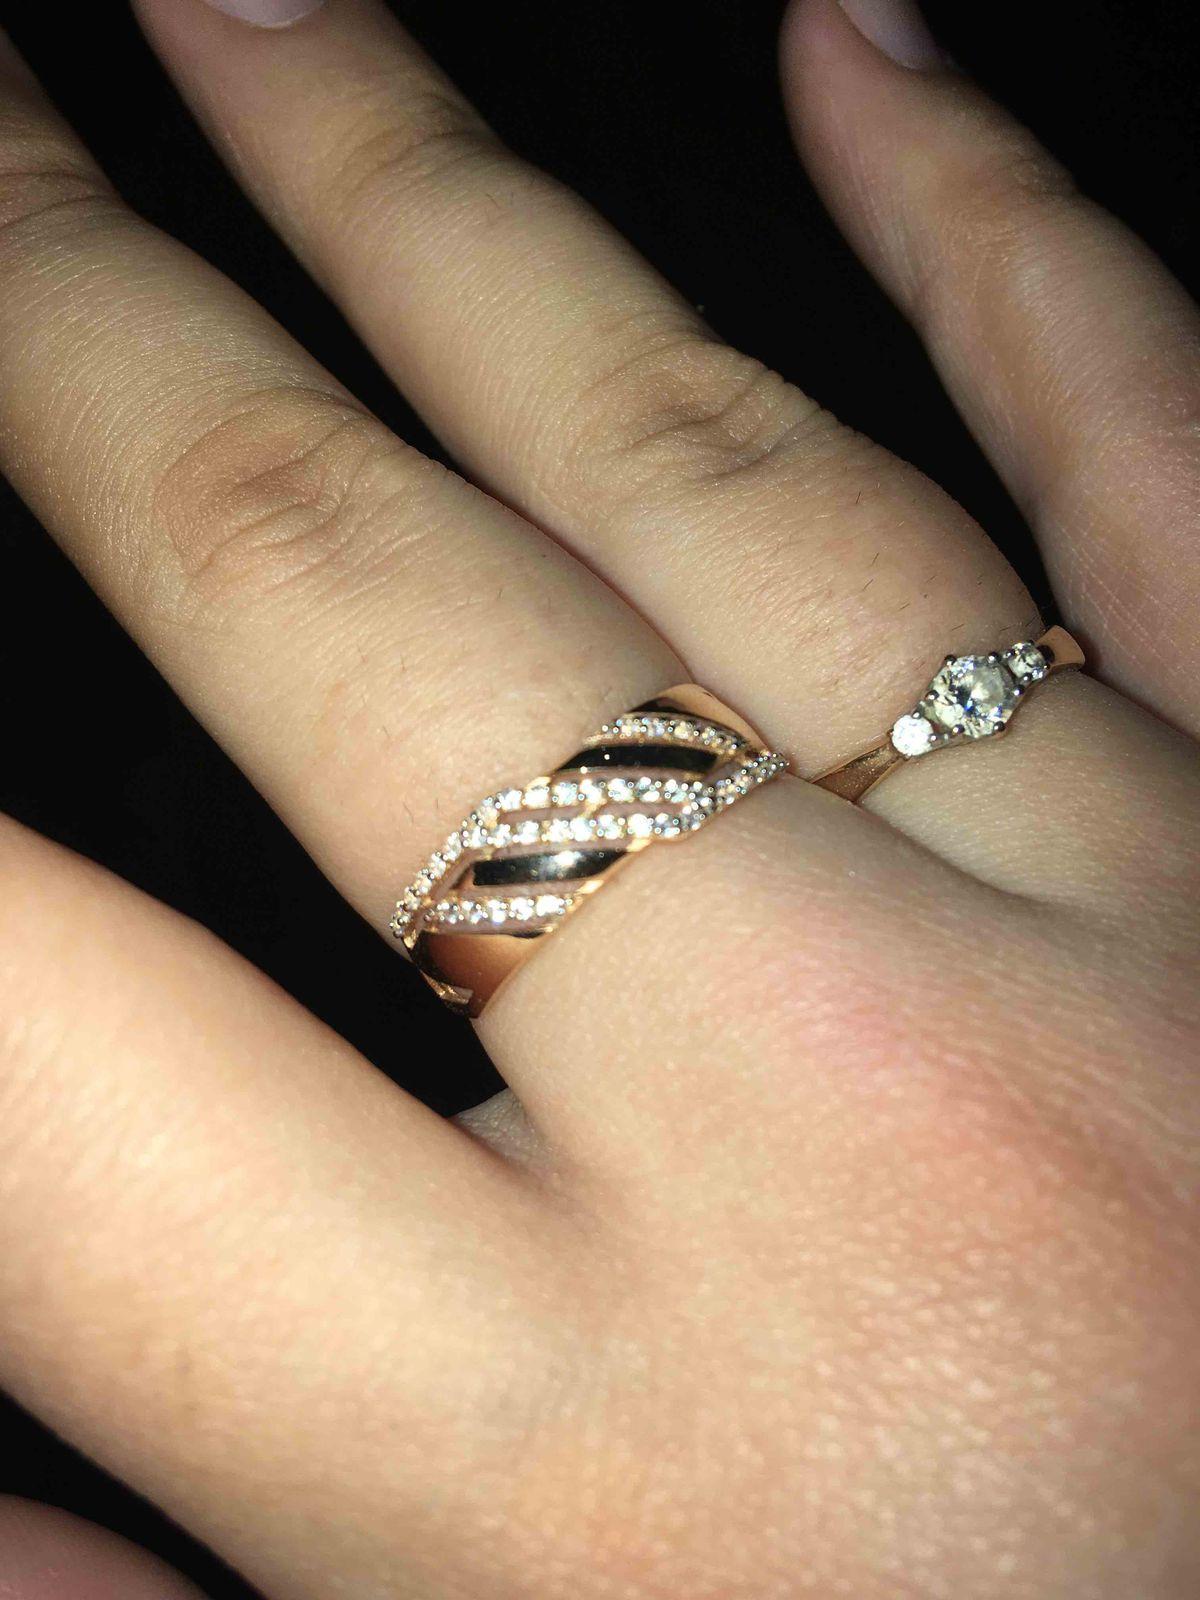 Шикарное кольцо!👌🏾